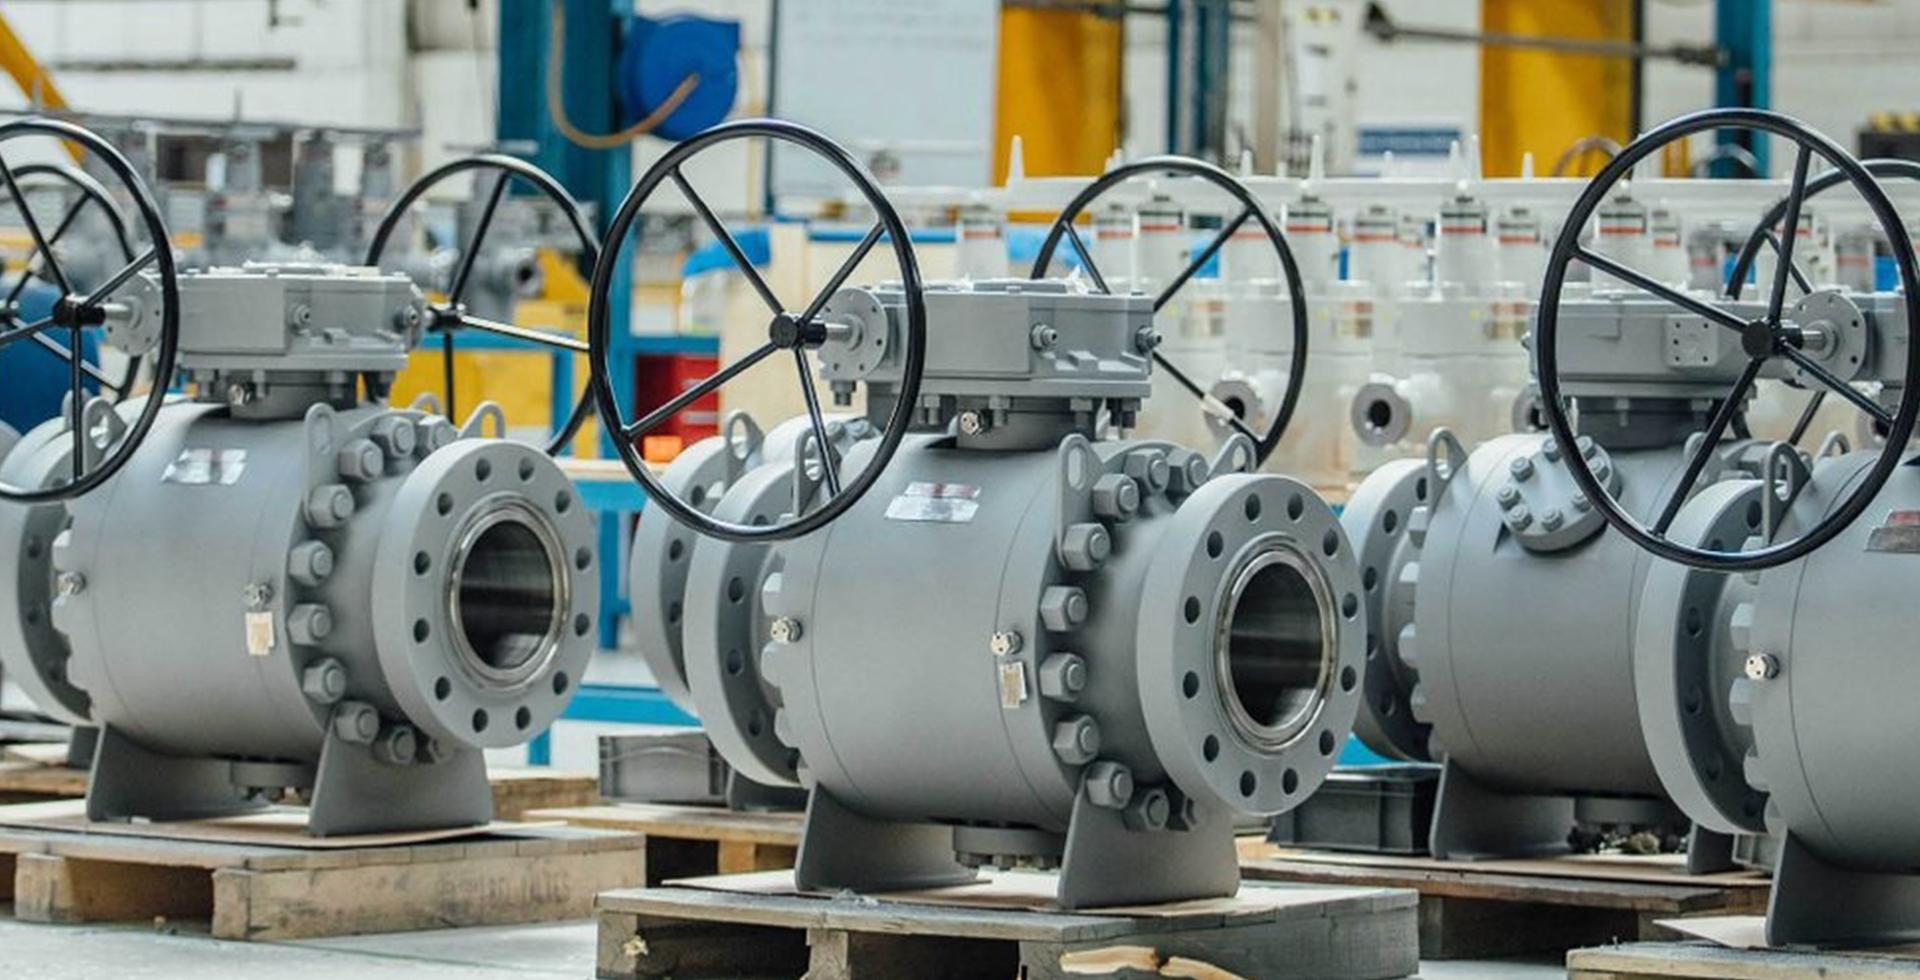 Globe valve manufacturer in india displays grey painted industrial valves inside the workshop